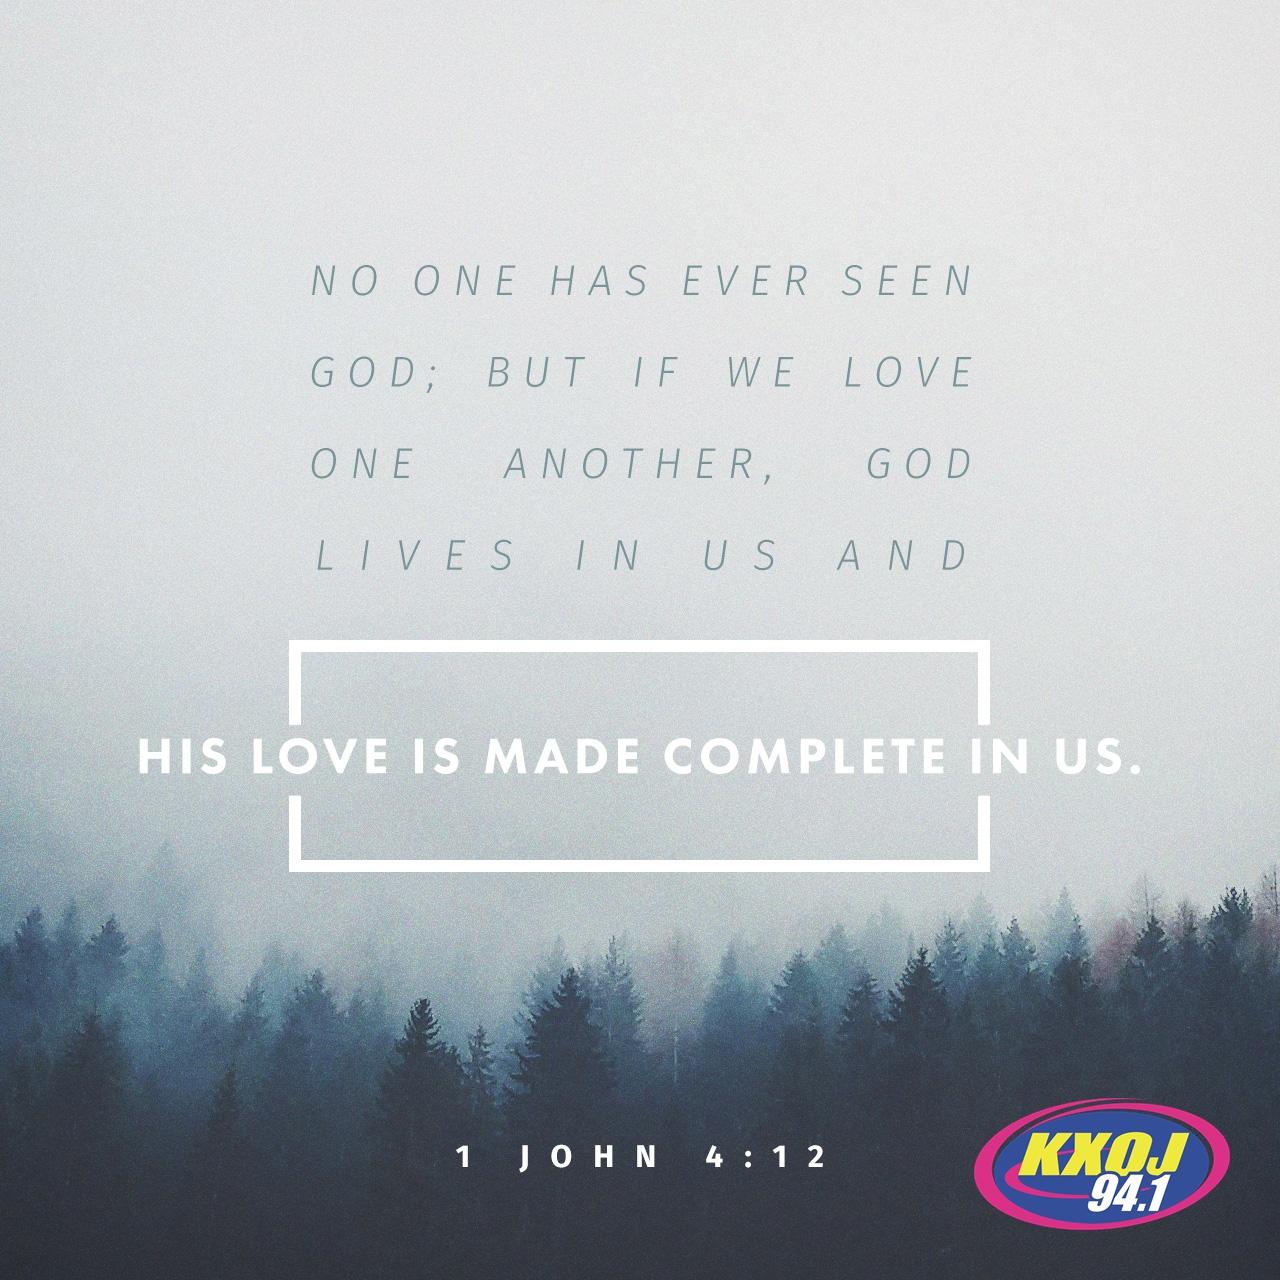 July 30th - 1st John 4:12